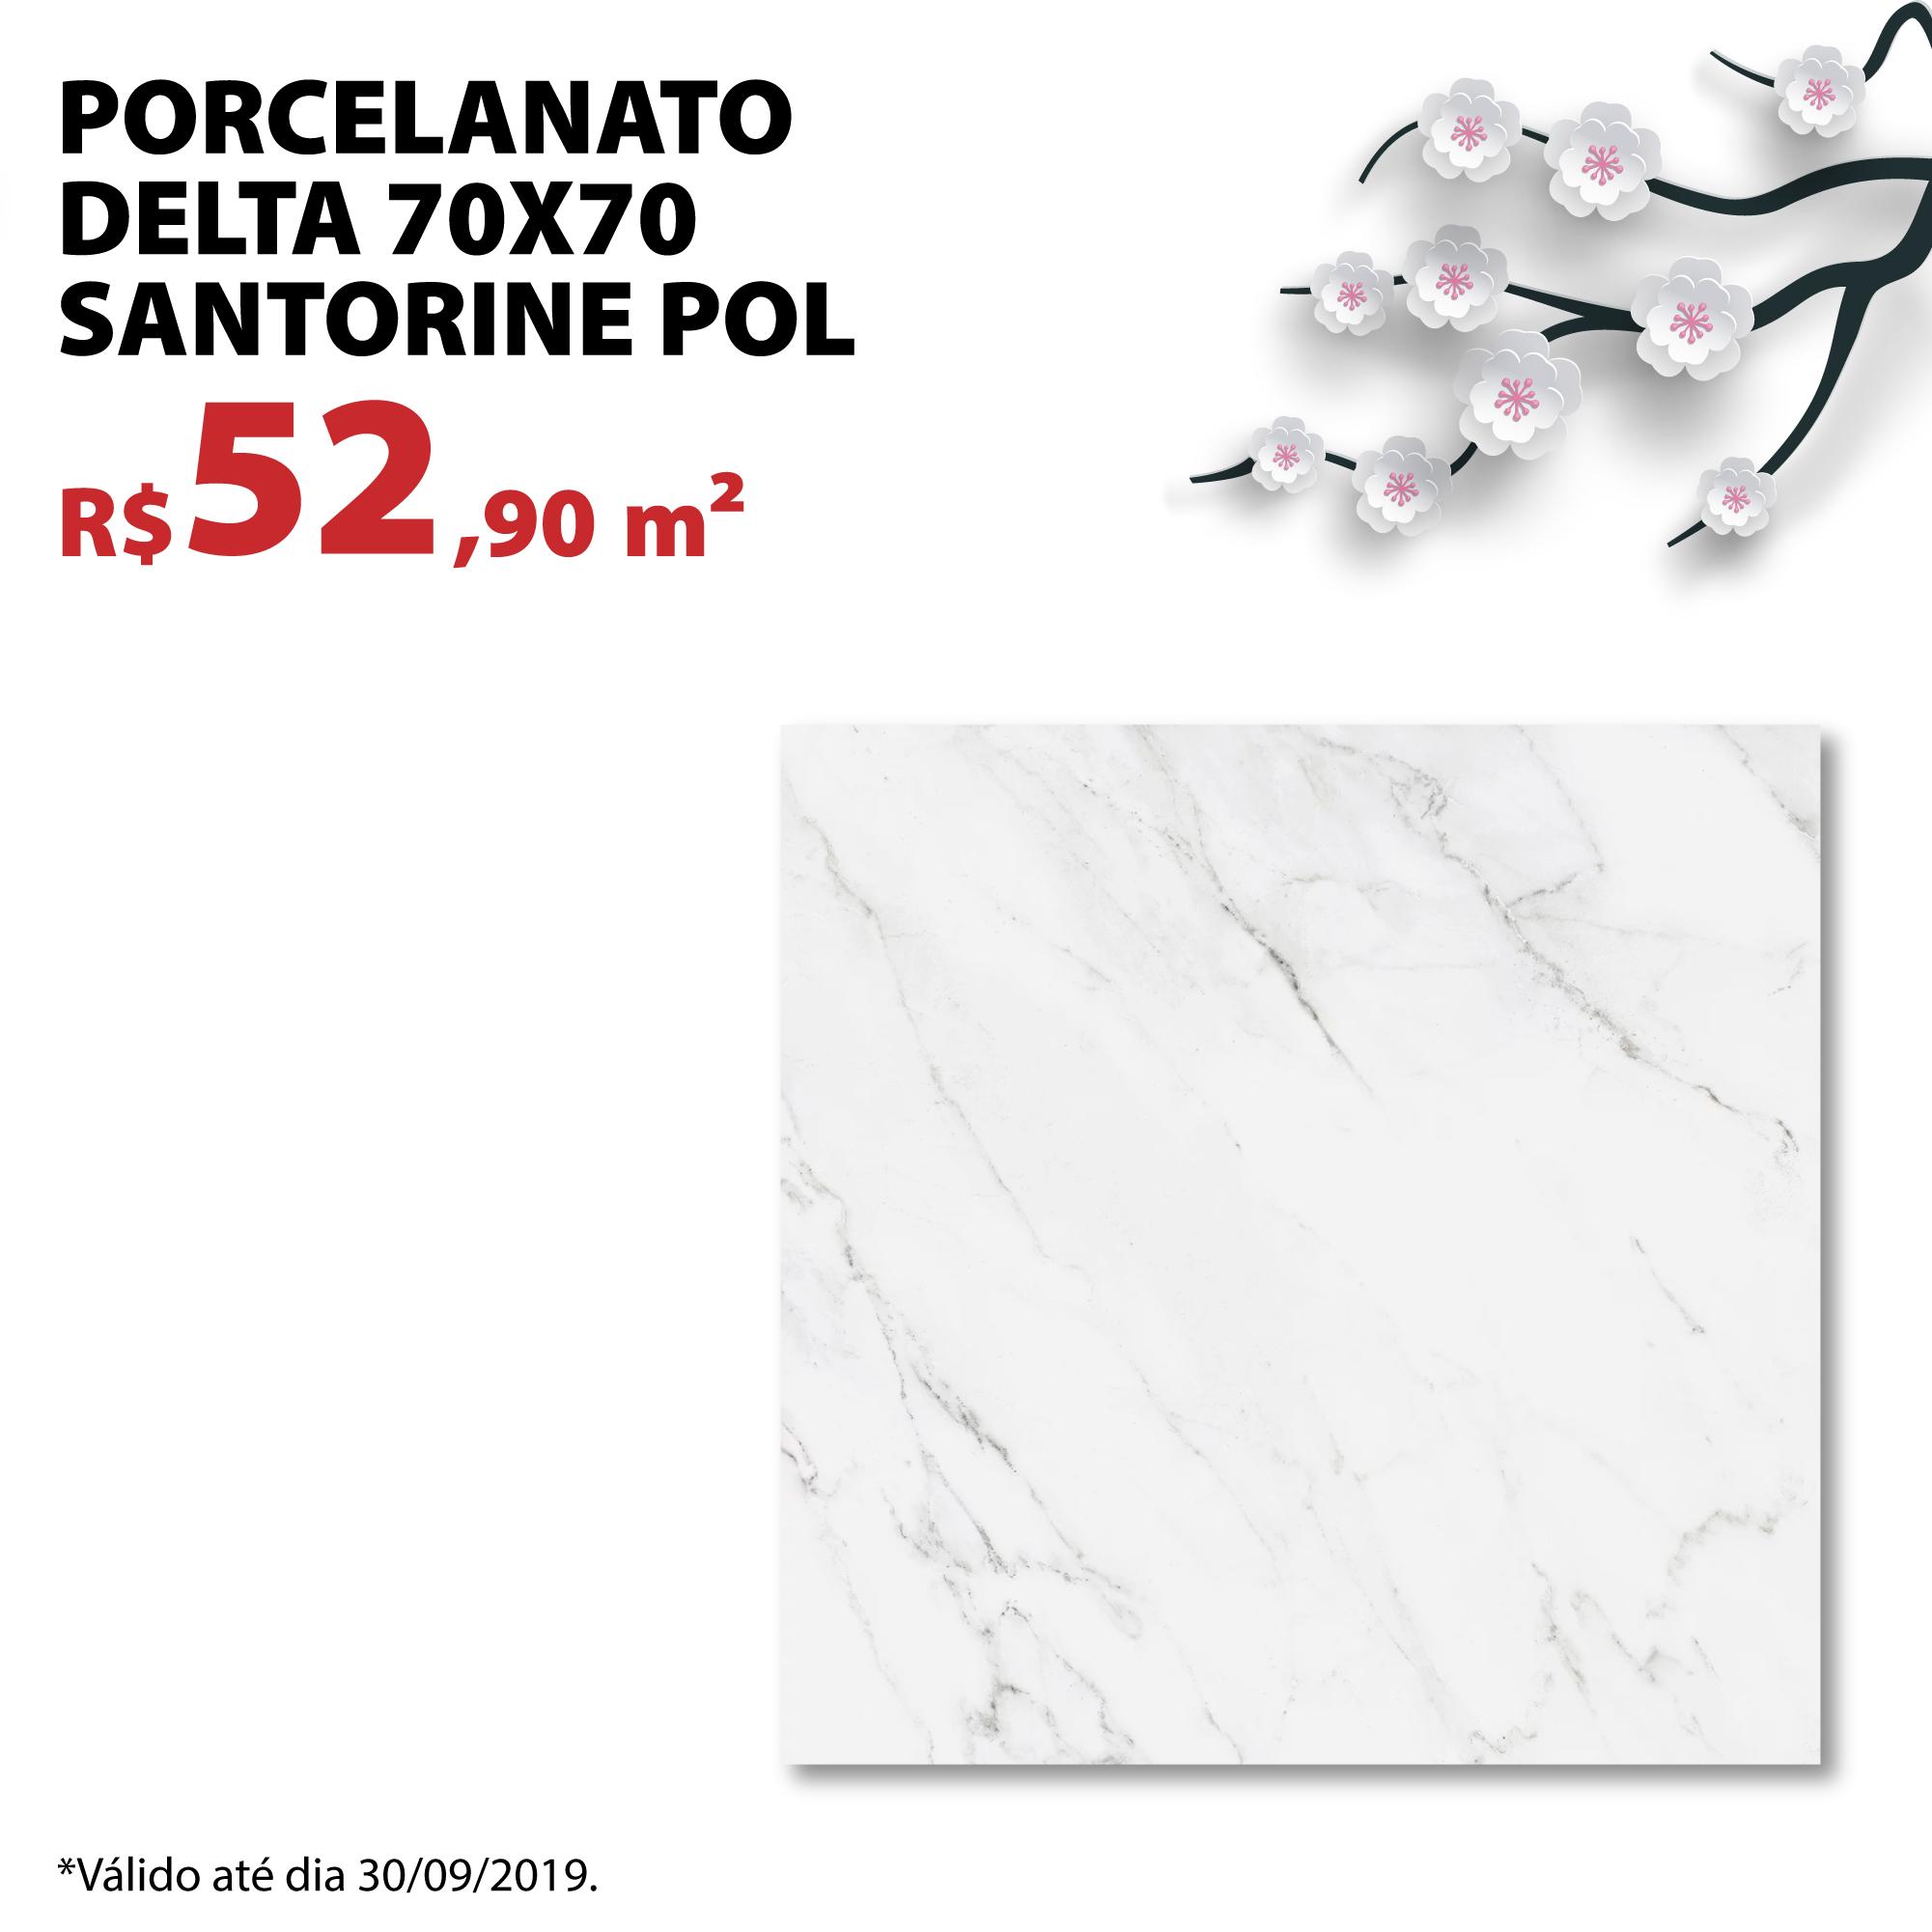 Porcelanato Delta 70×70 Santorine Pol